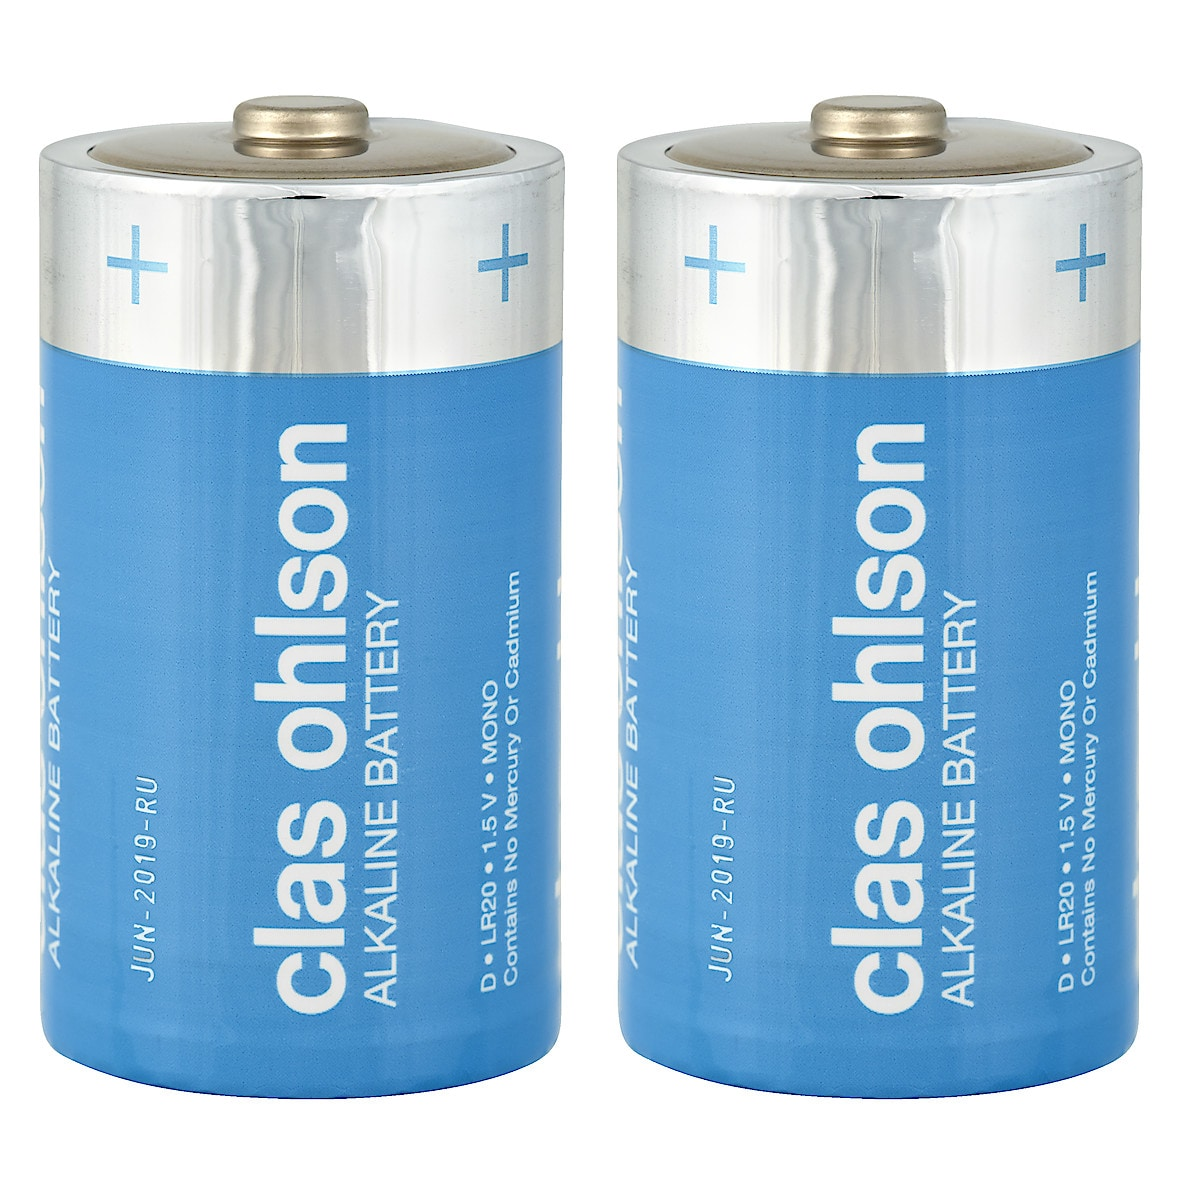 Alkaliparisto D/LR20 Clas Ohlson